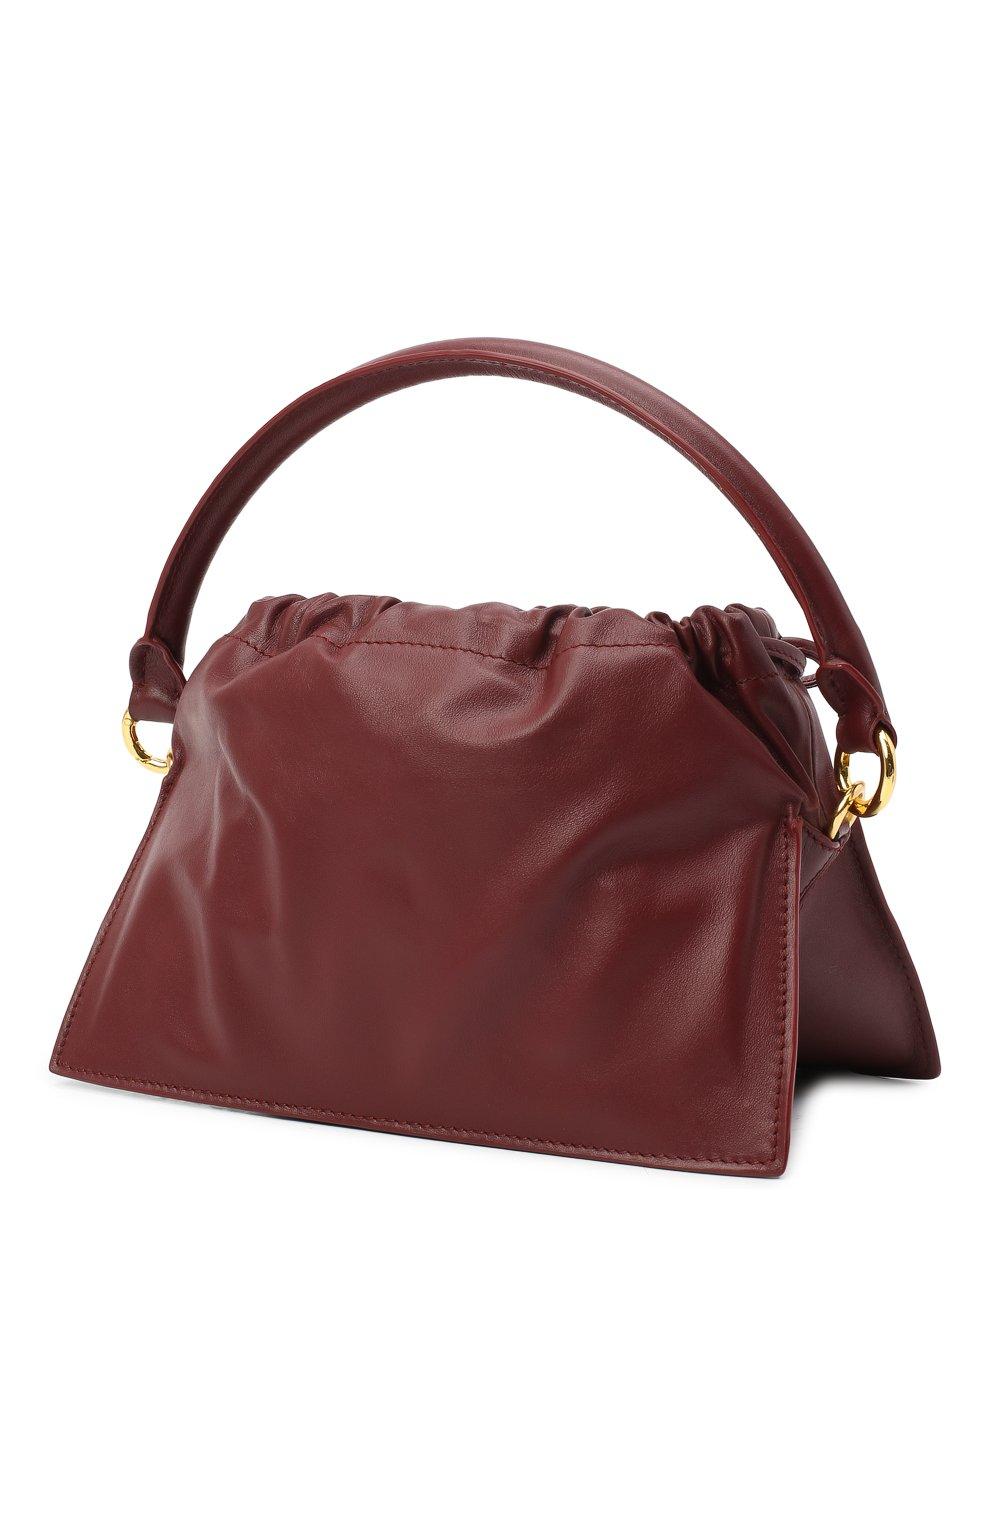 Женская сумка bom mini YUZEFI бордового цвета, арт. YUZAW20-HB-B0-02 | Фото 3 (Сумки-технические: Сумки через плечо, Сумки top-handle; Материал: Натуральная кожа; Размер: mini; Ремень/цепочка: На ремешке)